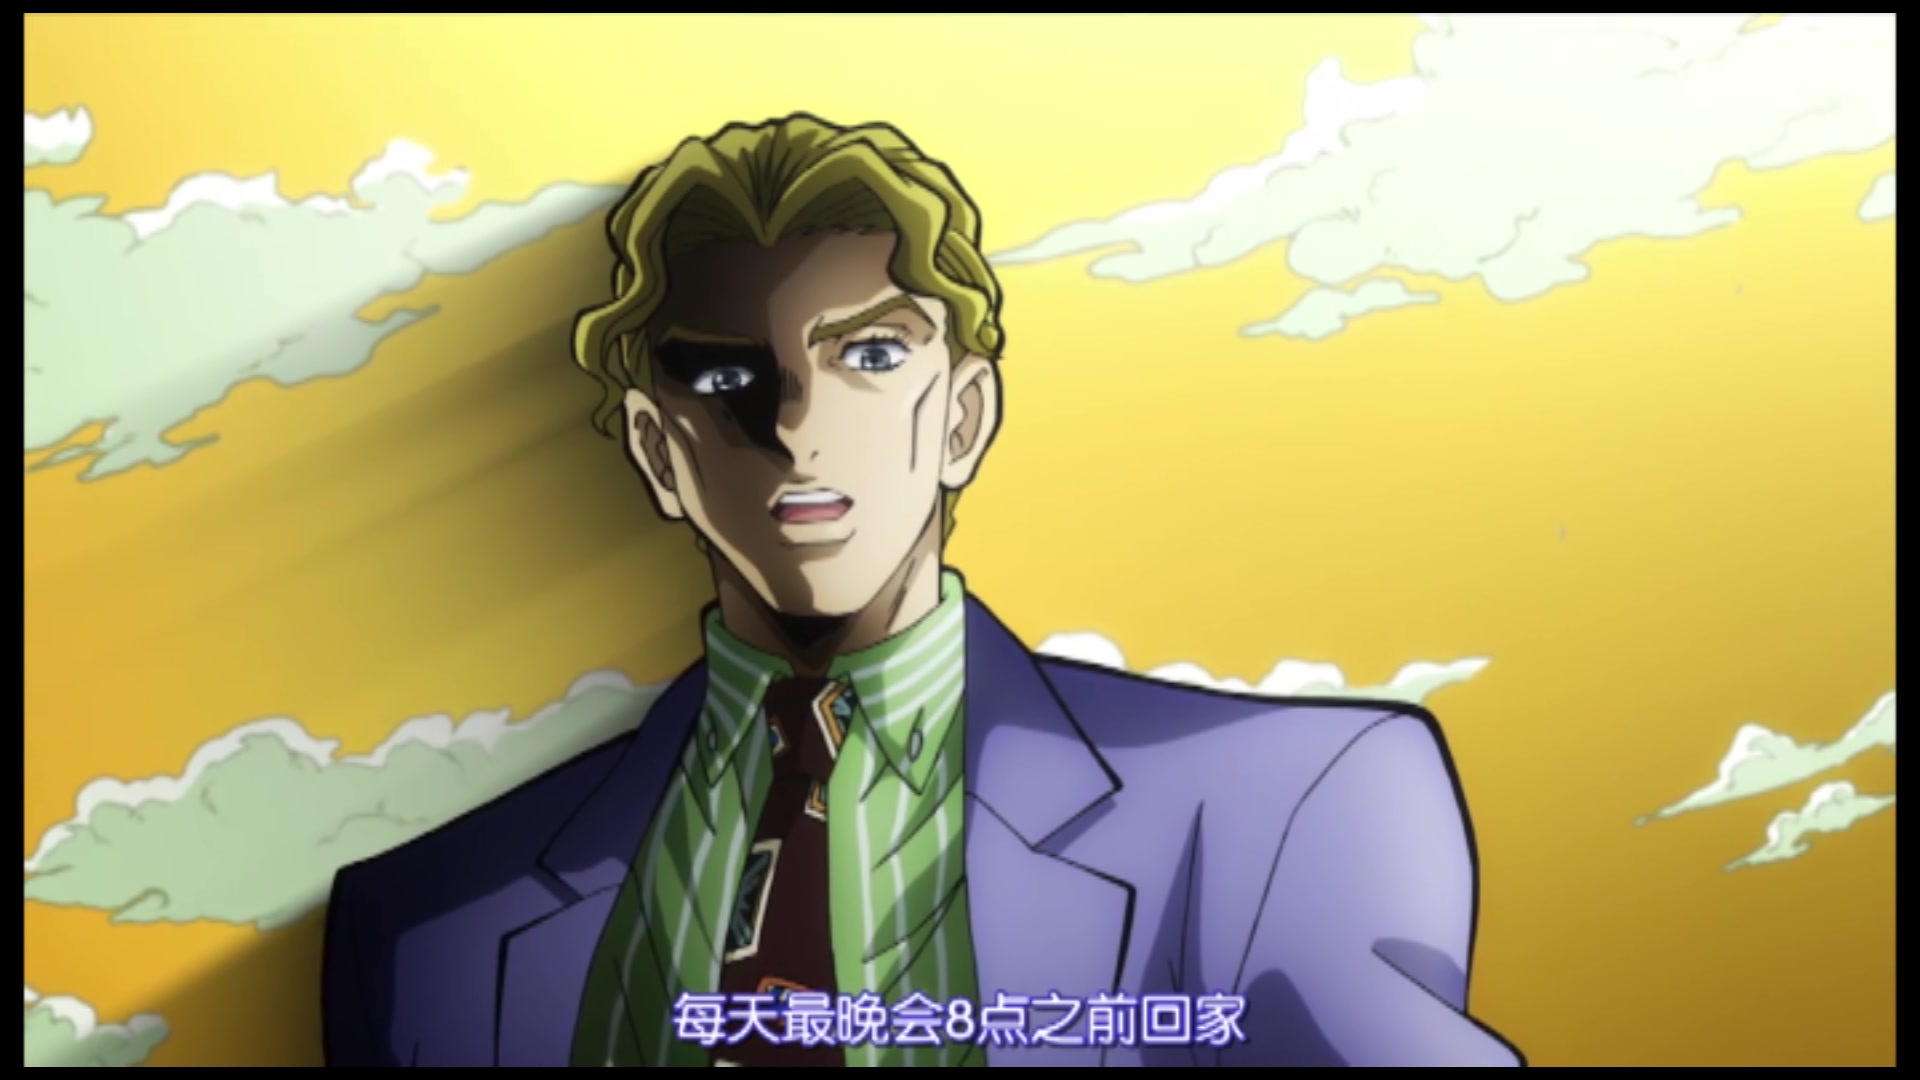 【jojo的奇妙冒險】吉良吉影的自我介紹_嗶哩嗶哩 (゜-゜)つロ 干 ...